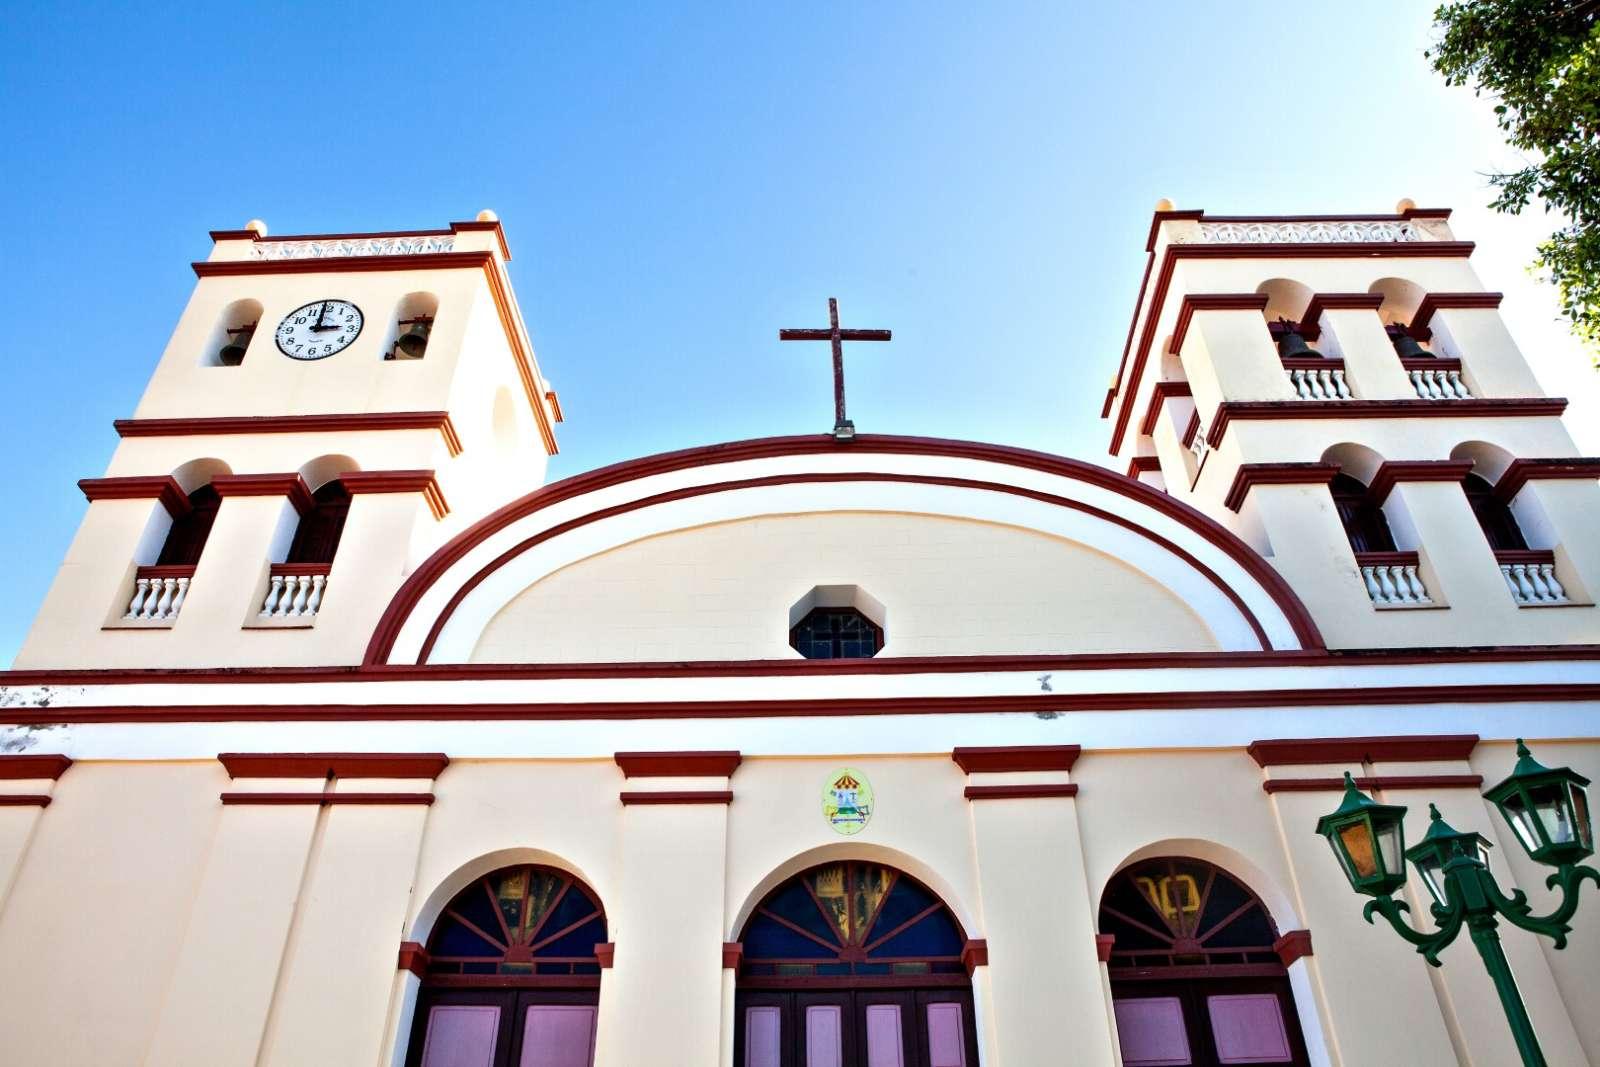 Catedral De Nuestra Senora De La Asuncion in Baracoa The Central Plaza